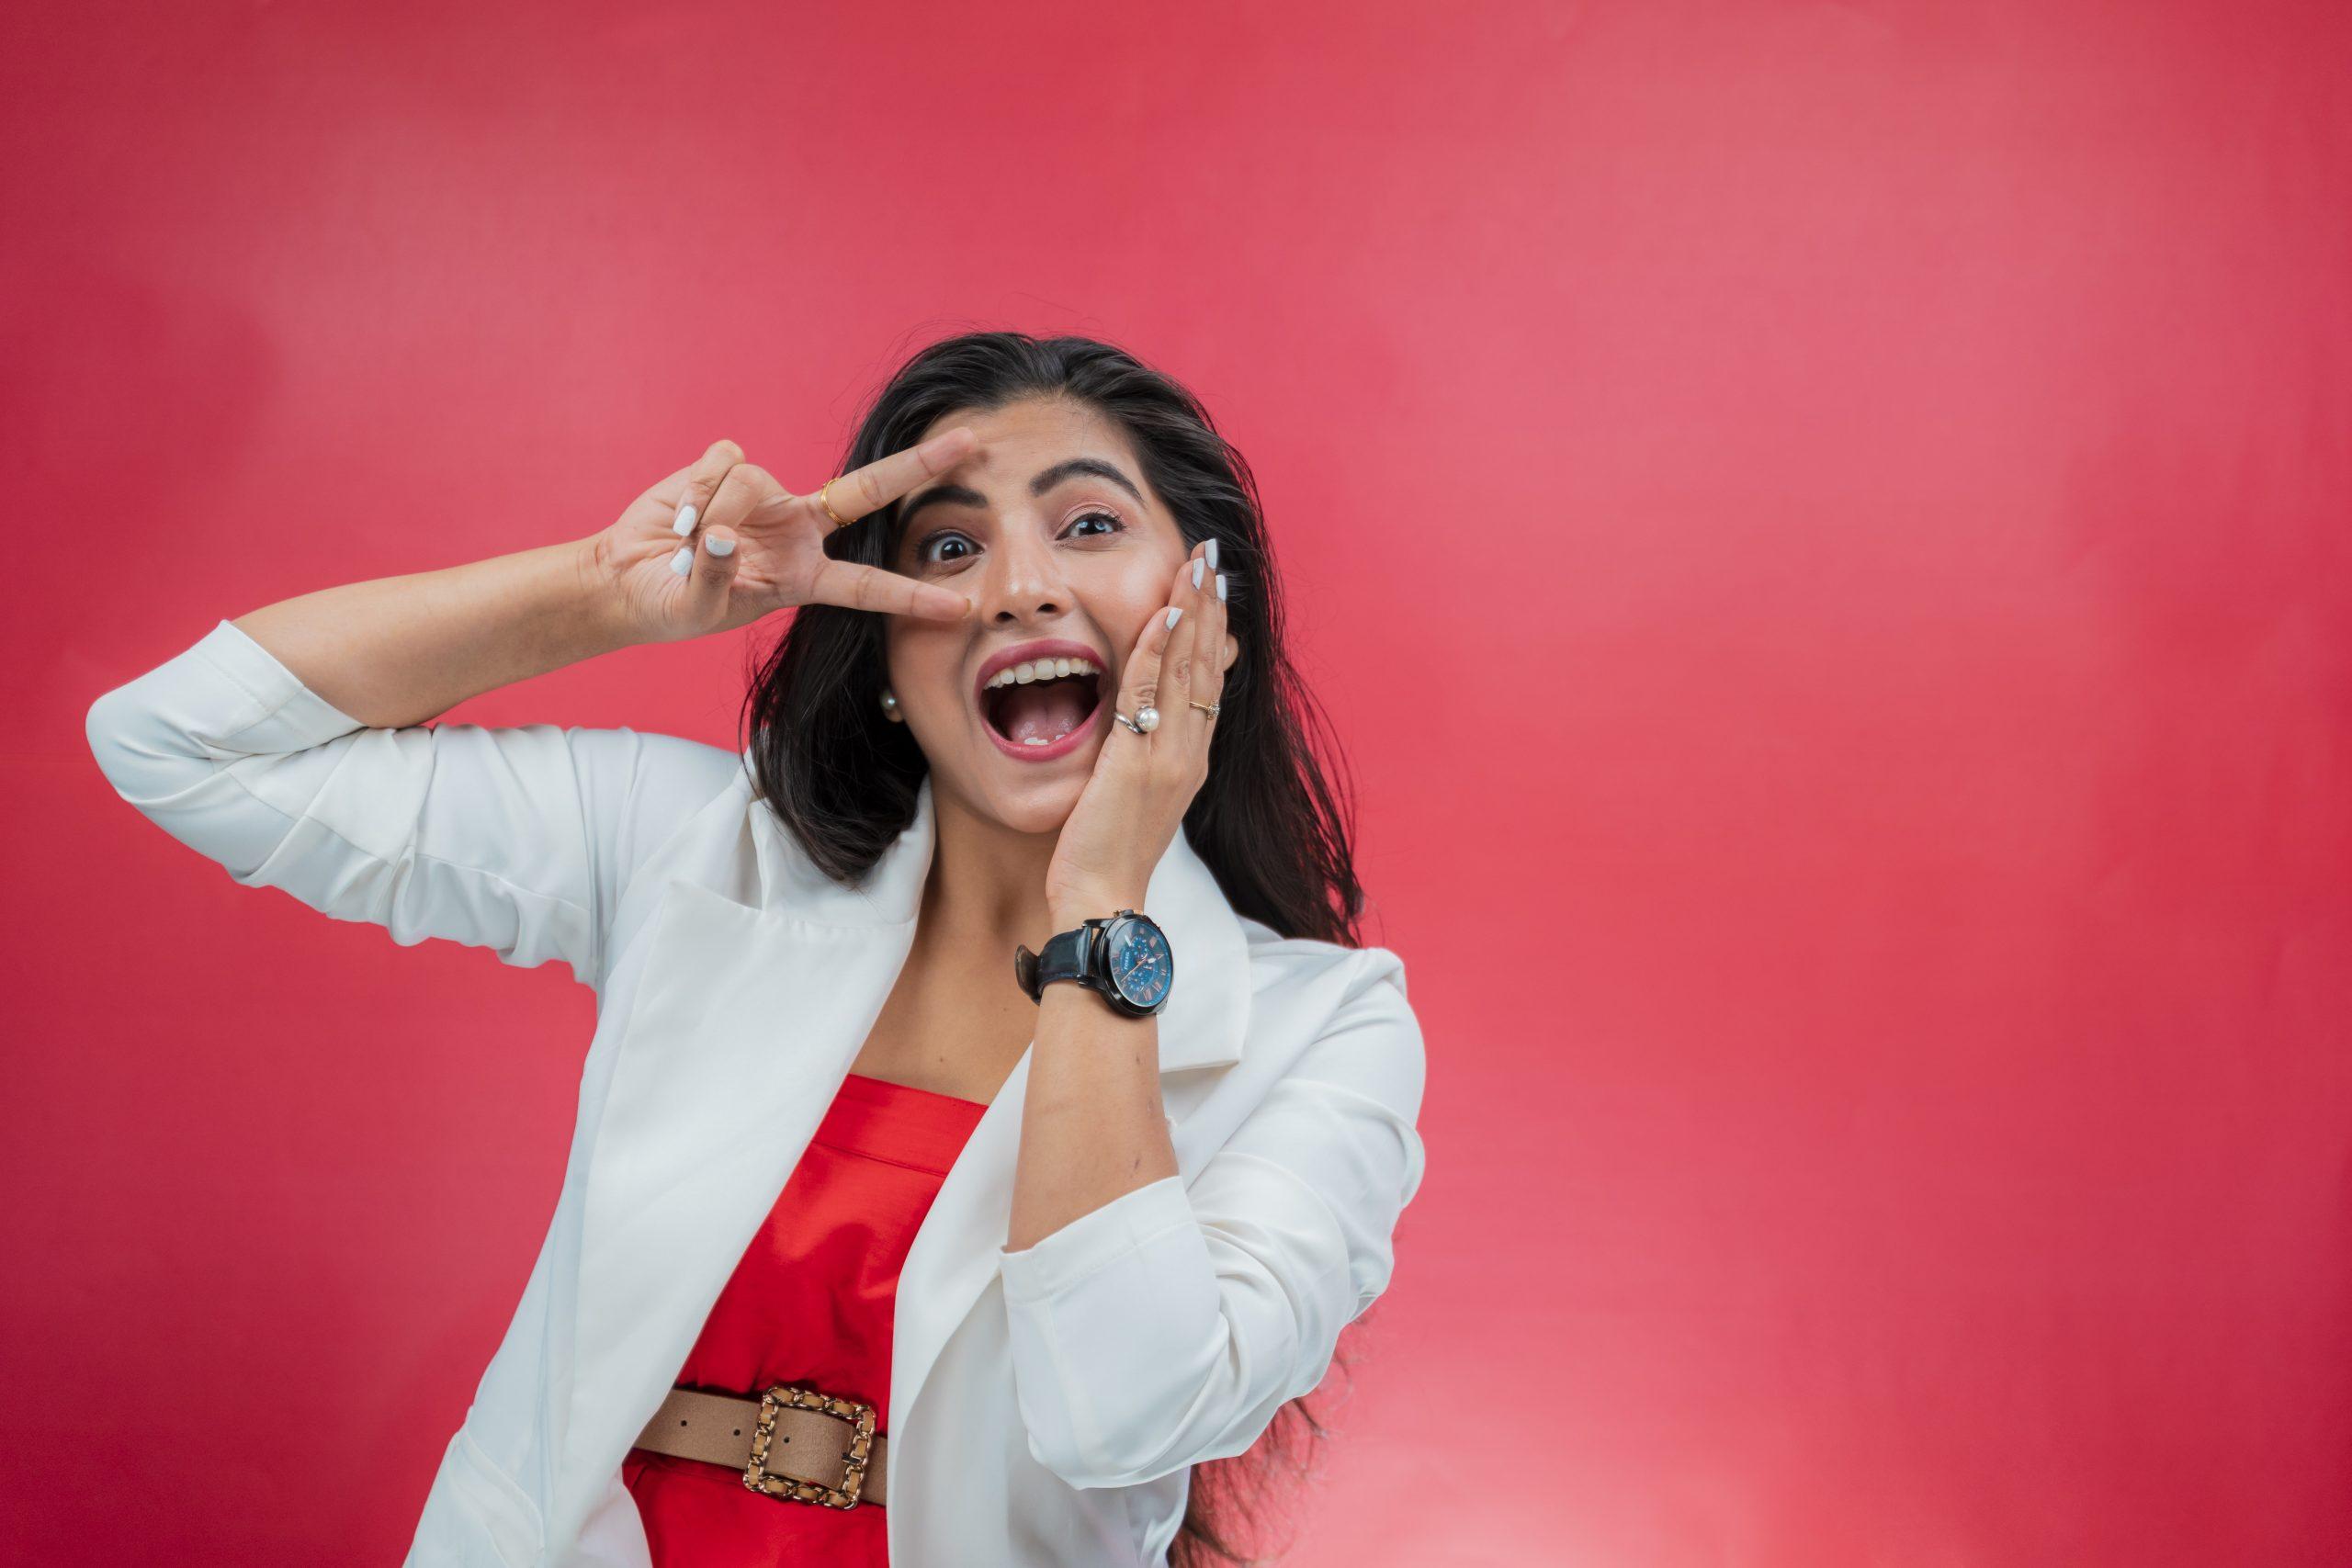 Super happy Indian girl